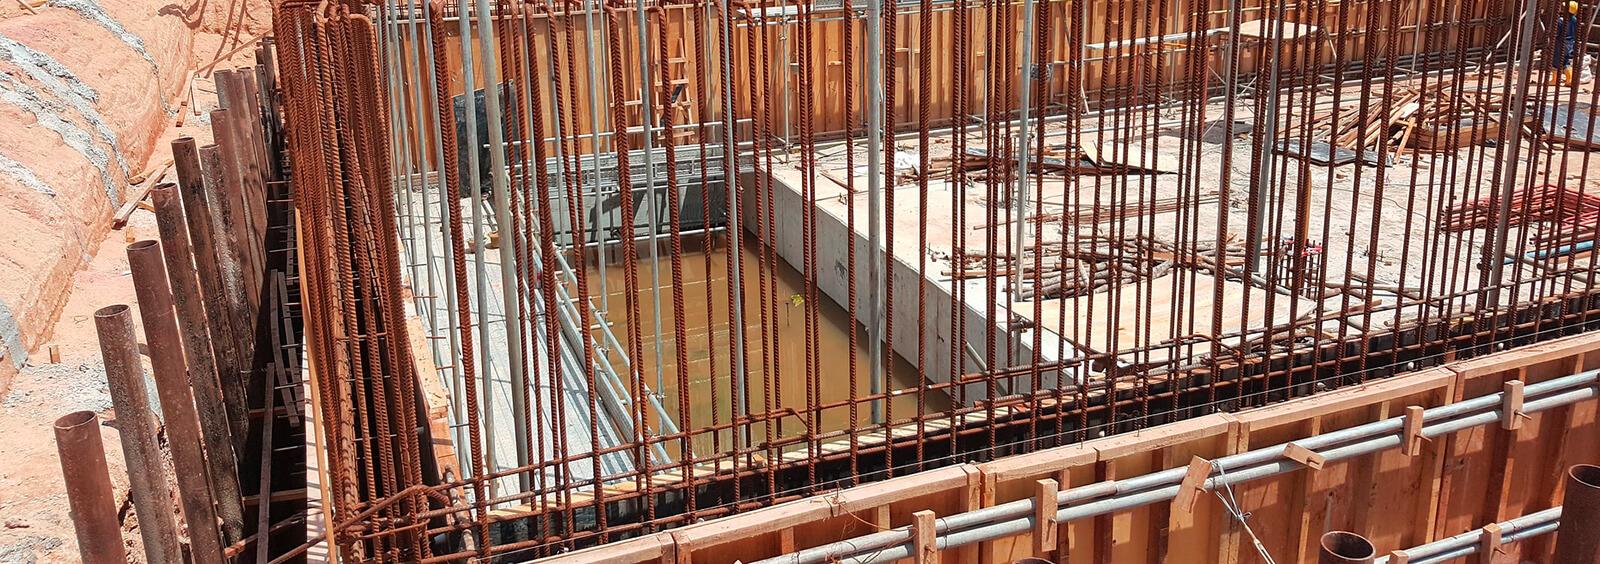 beton na fundamenty beton do budowy domu waab. Black Bedroom Furniture Sets. Home Design Ideas